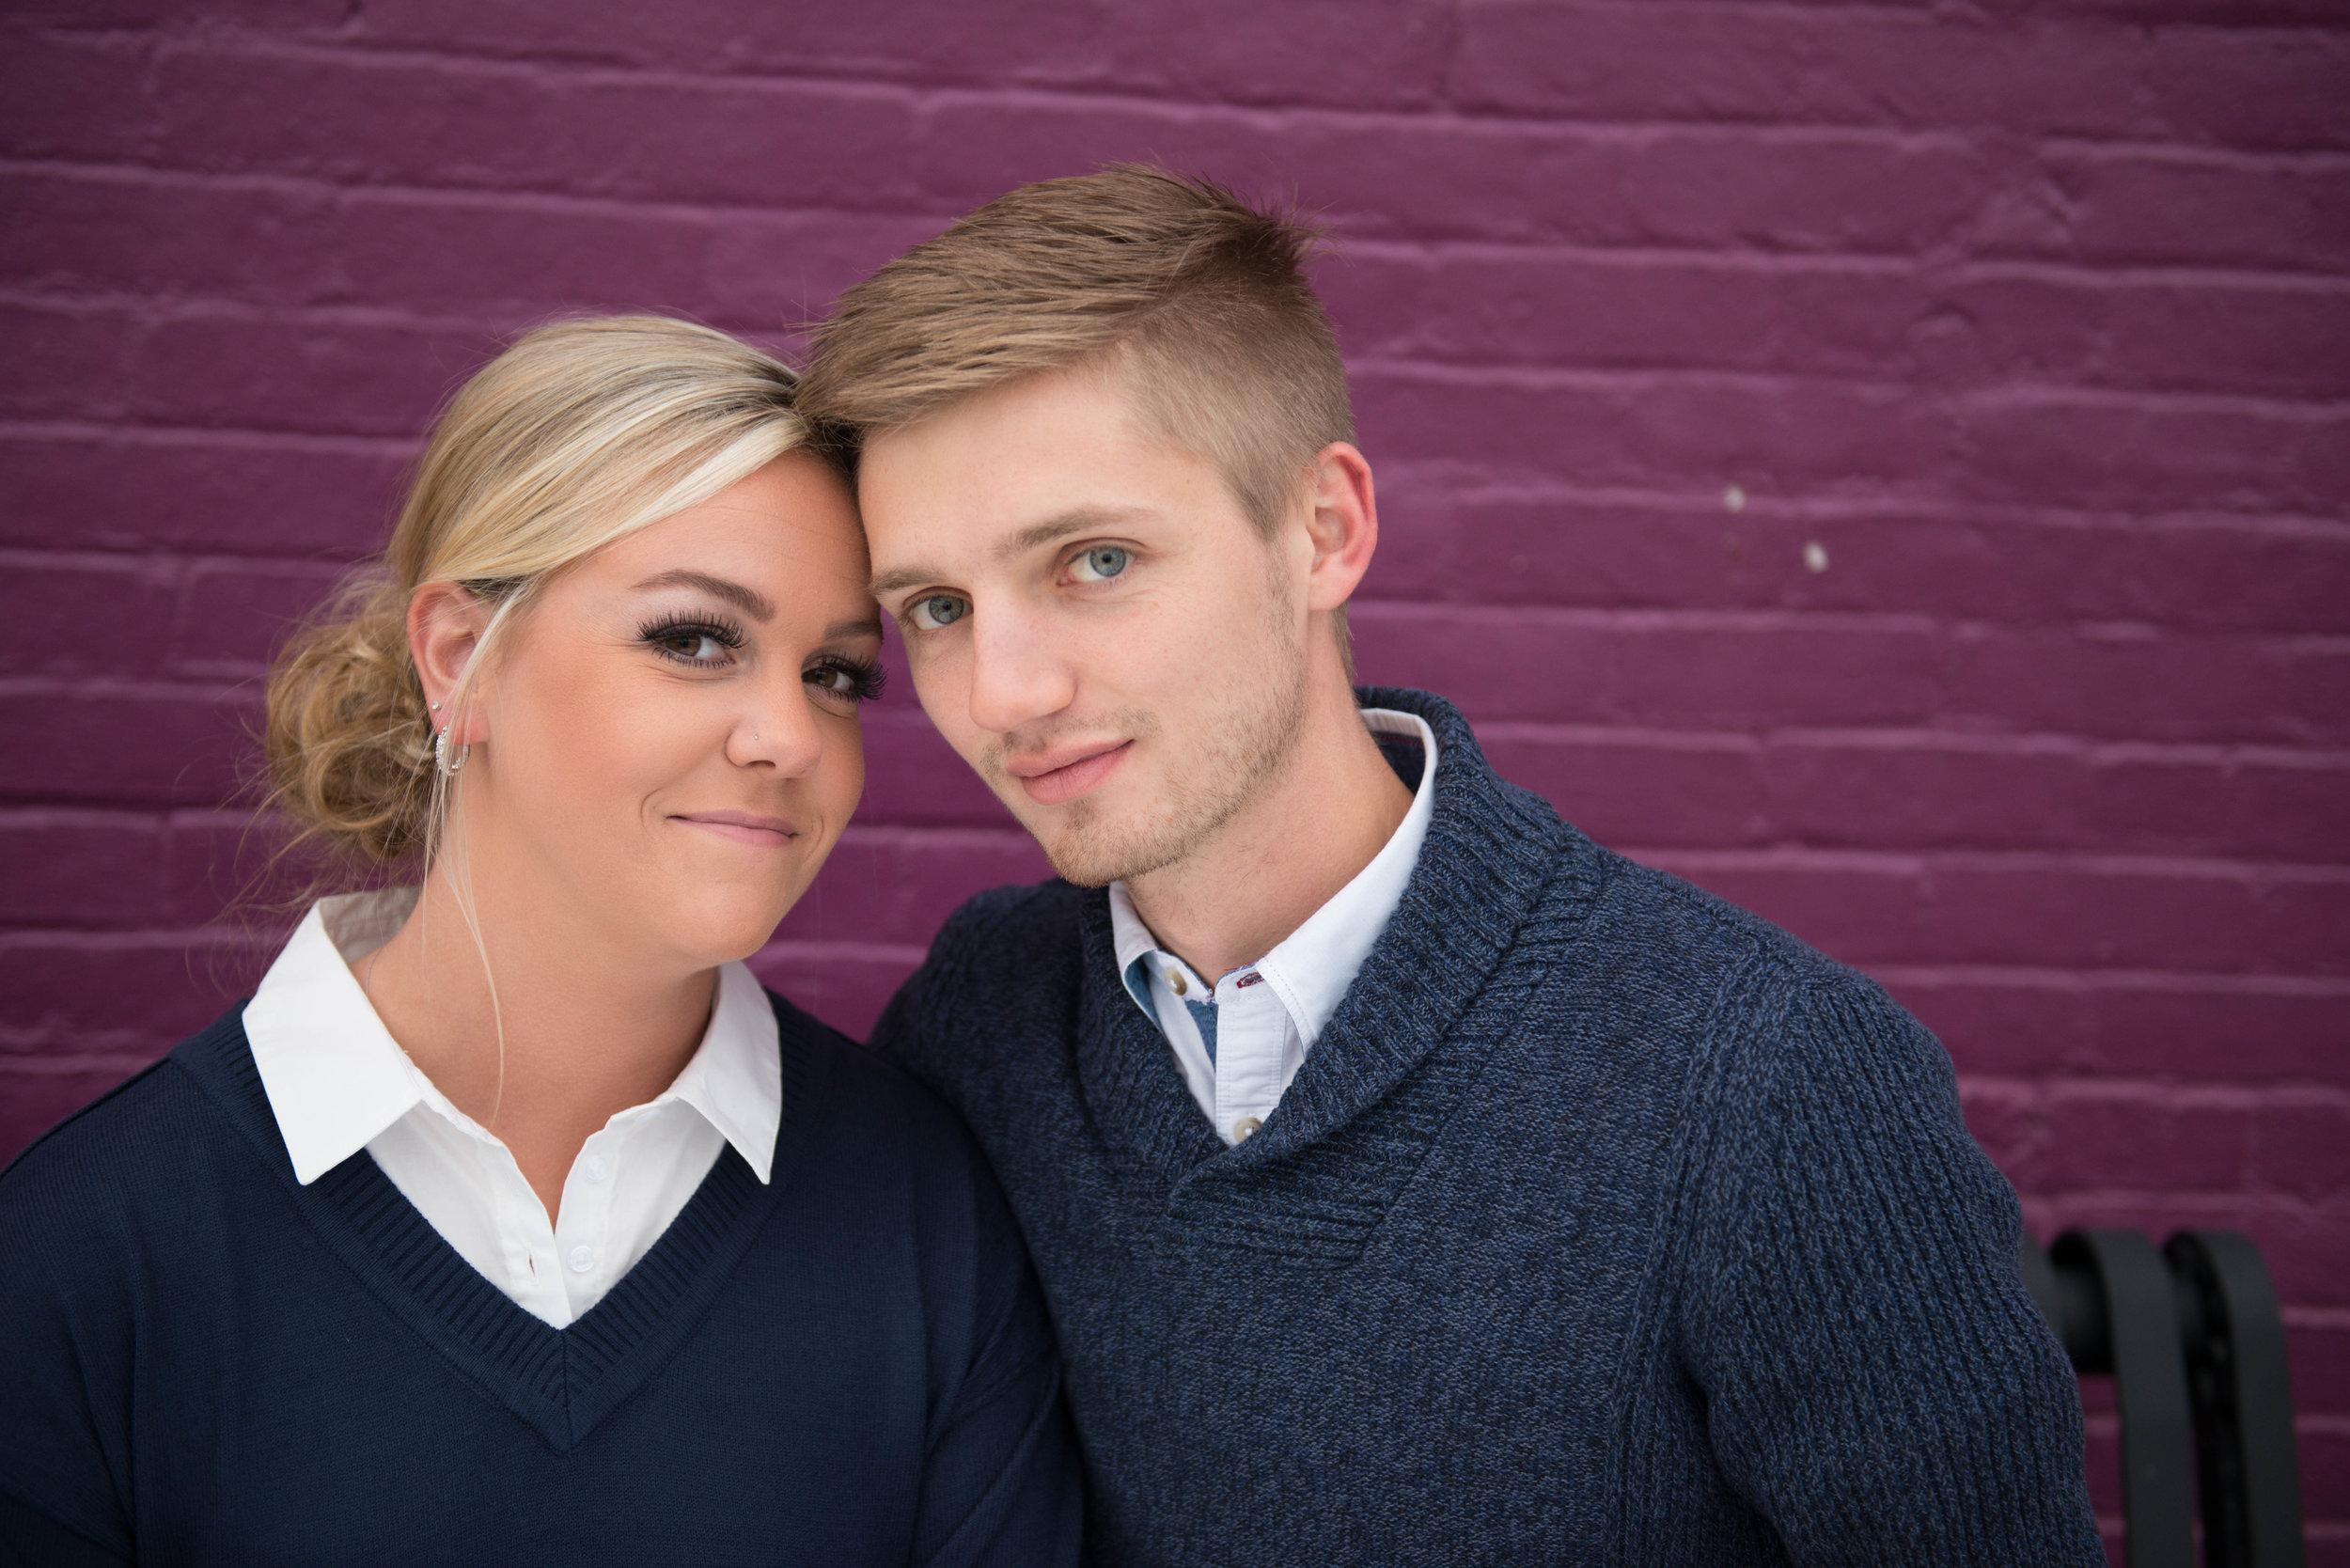 metro-detroit-wedding-photographer-enagement-Villella-022.jpg